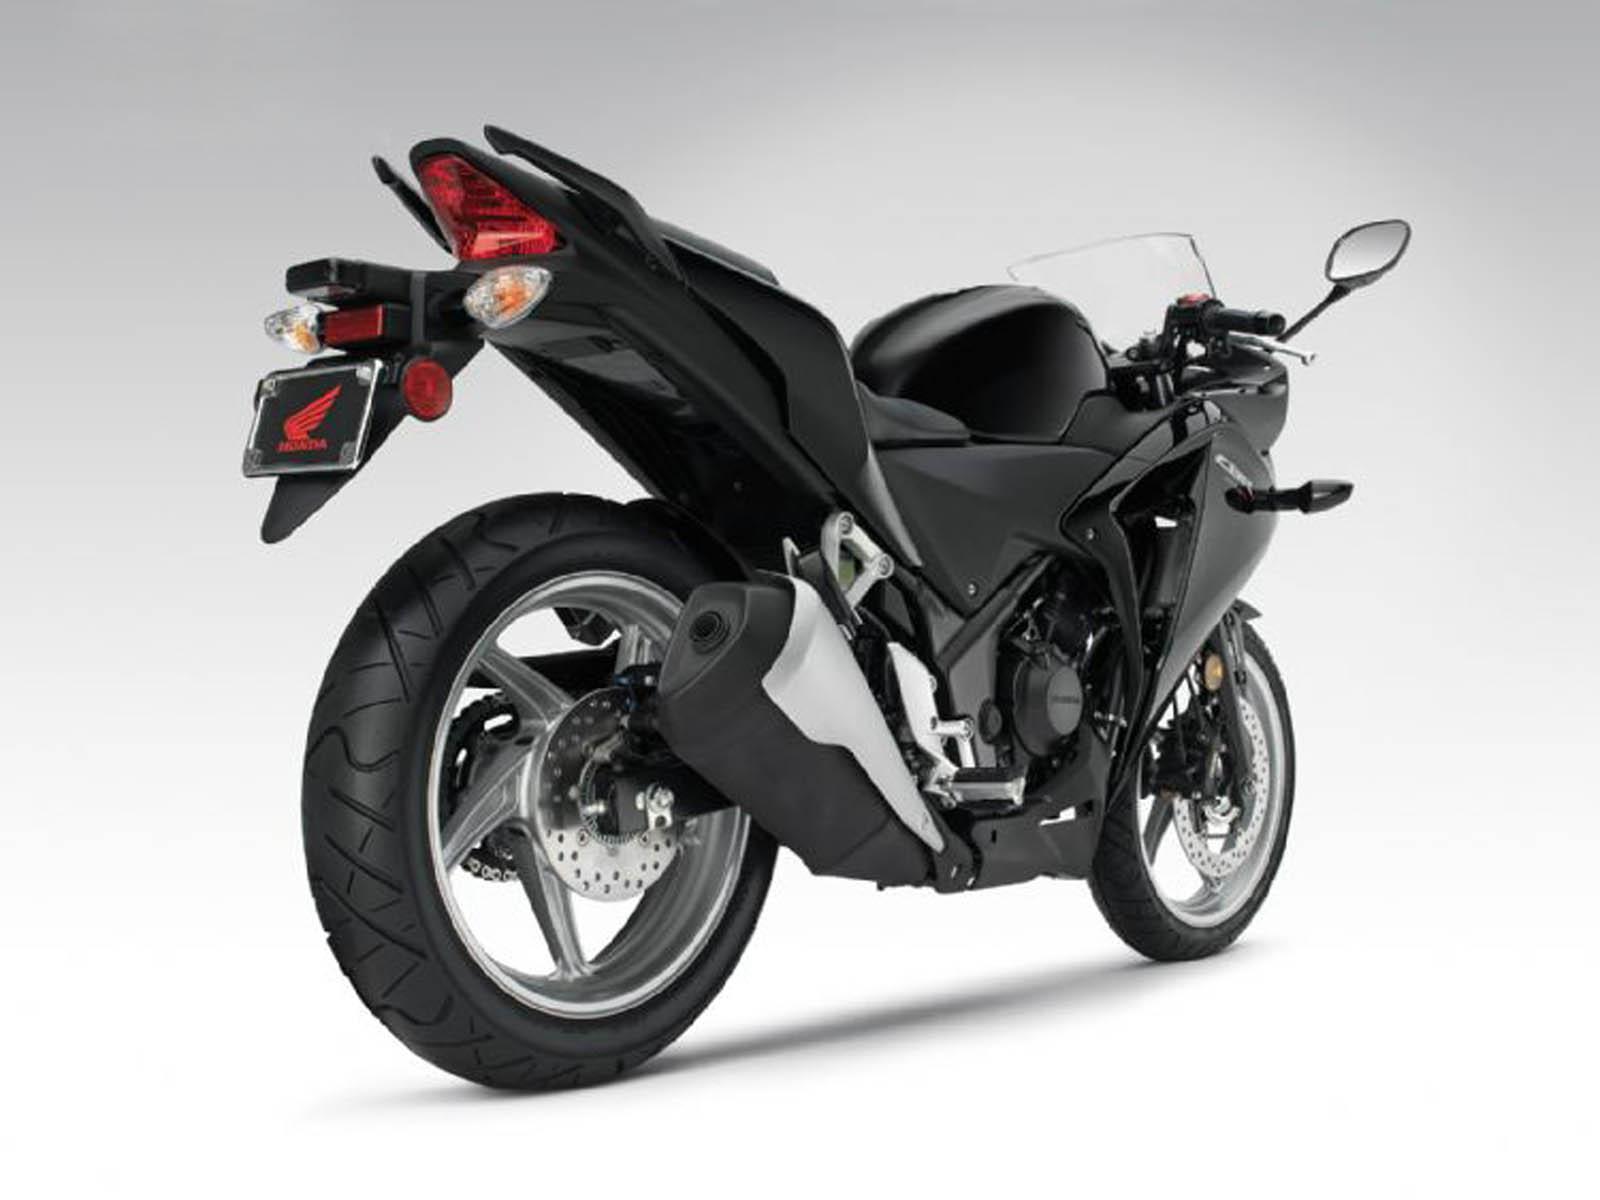 http://1.bp.blogspot.com/-lXSffoLjje4/UBa8hKD6EEI/AAAAAAAAG5c/_iZppk3iPrs/s1600/Honda+CBR+250R+Bike+Wallpapers+7.jpg